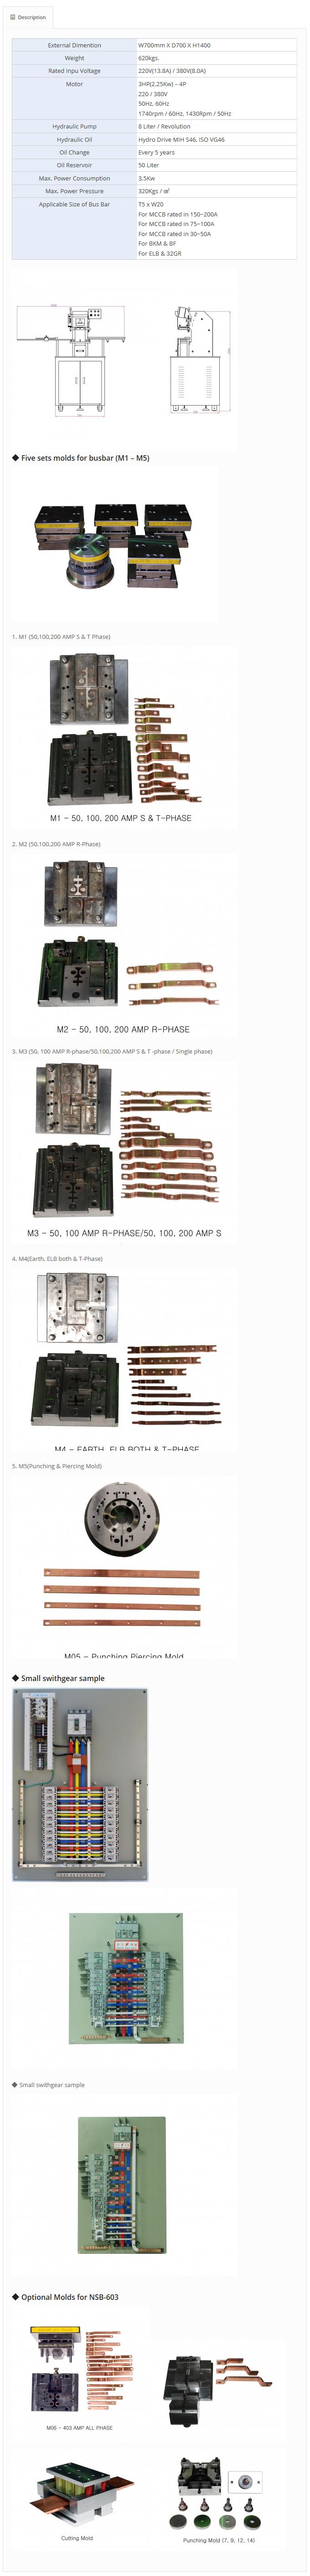 NAMSUNG Busbar fabrication machine for small switchgear box NSB-603